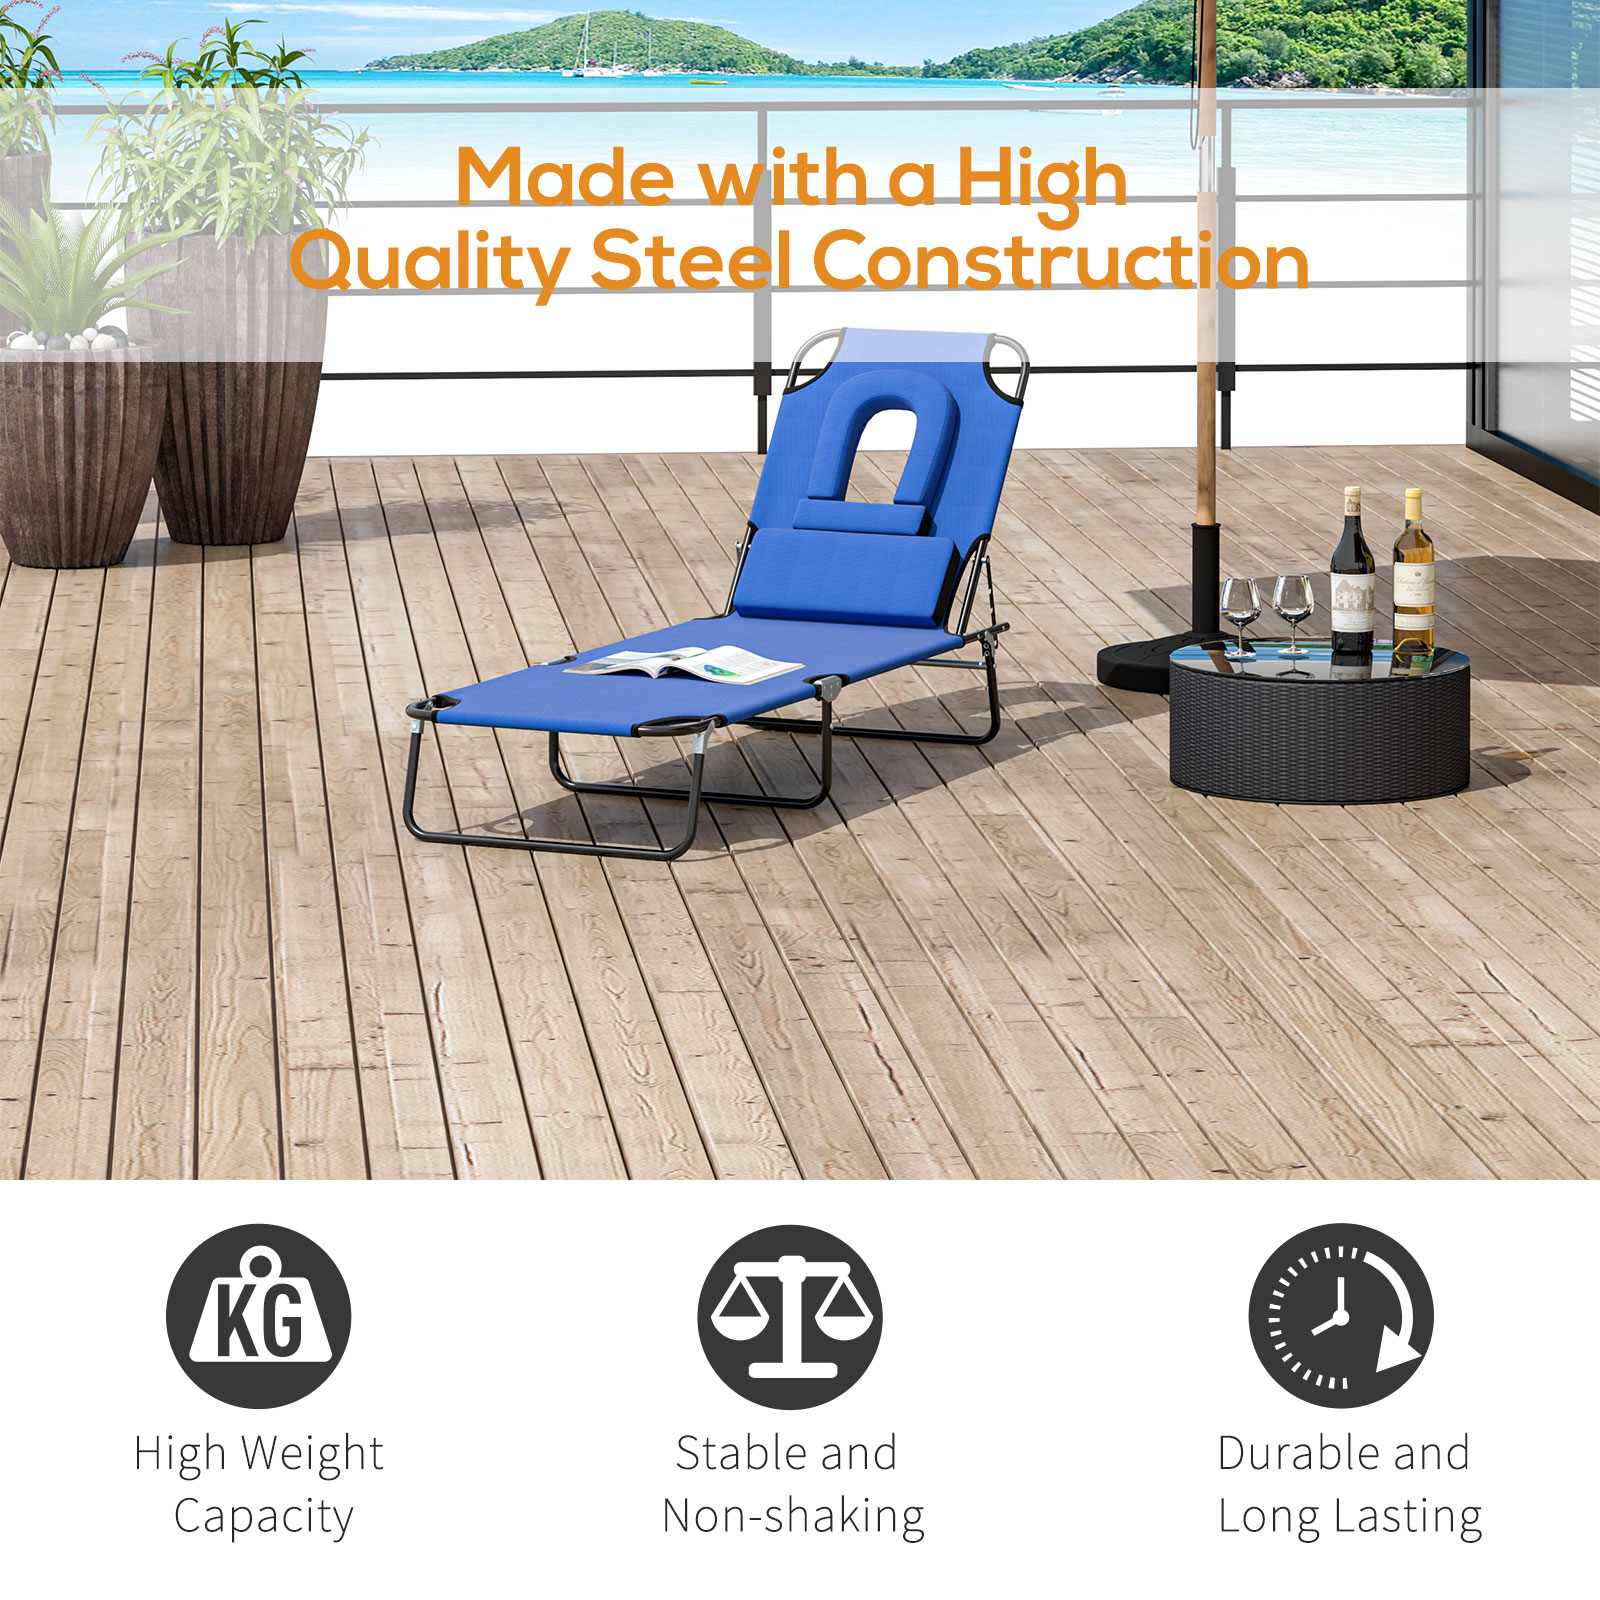 miniatura 16 - Silla Reclinable Plegable Tumbona Reclinable Jardín Al Aire Libre Portátil Asiento Cama